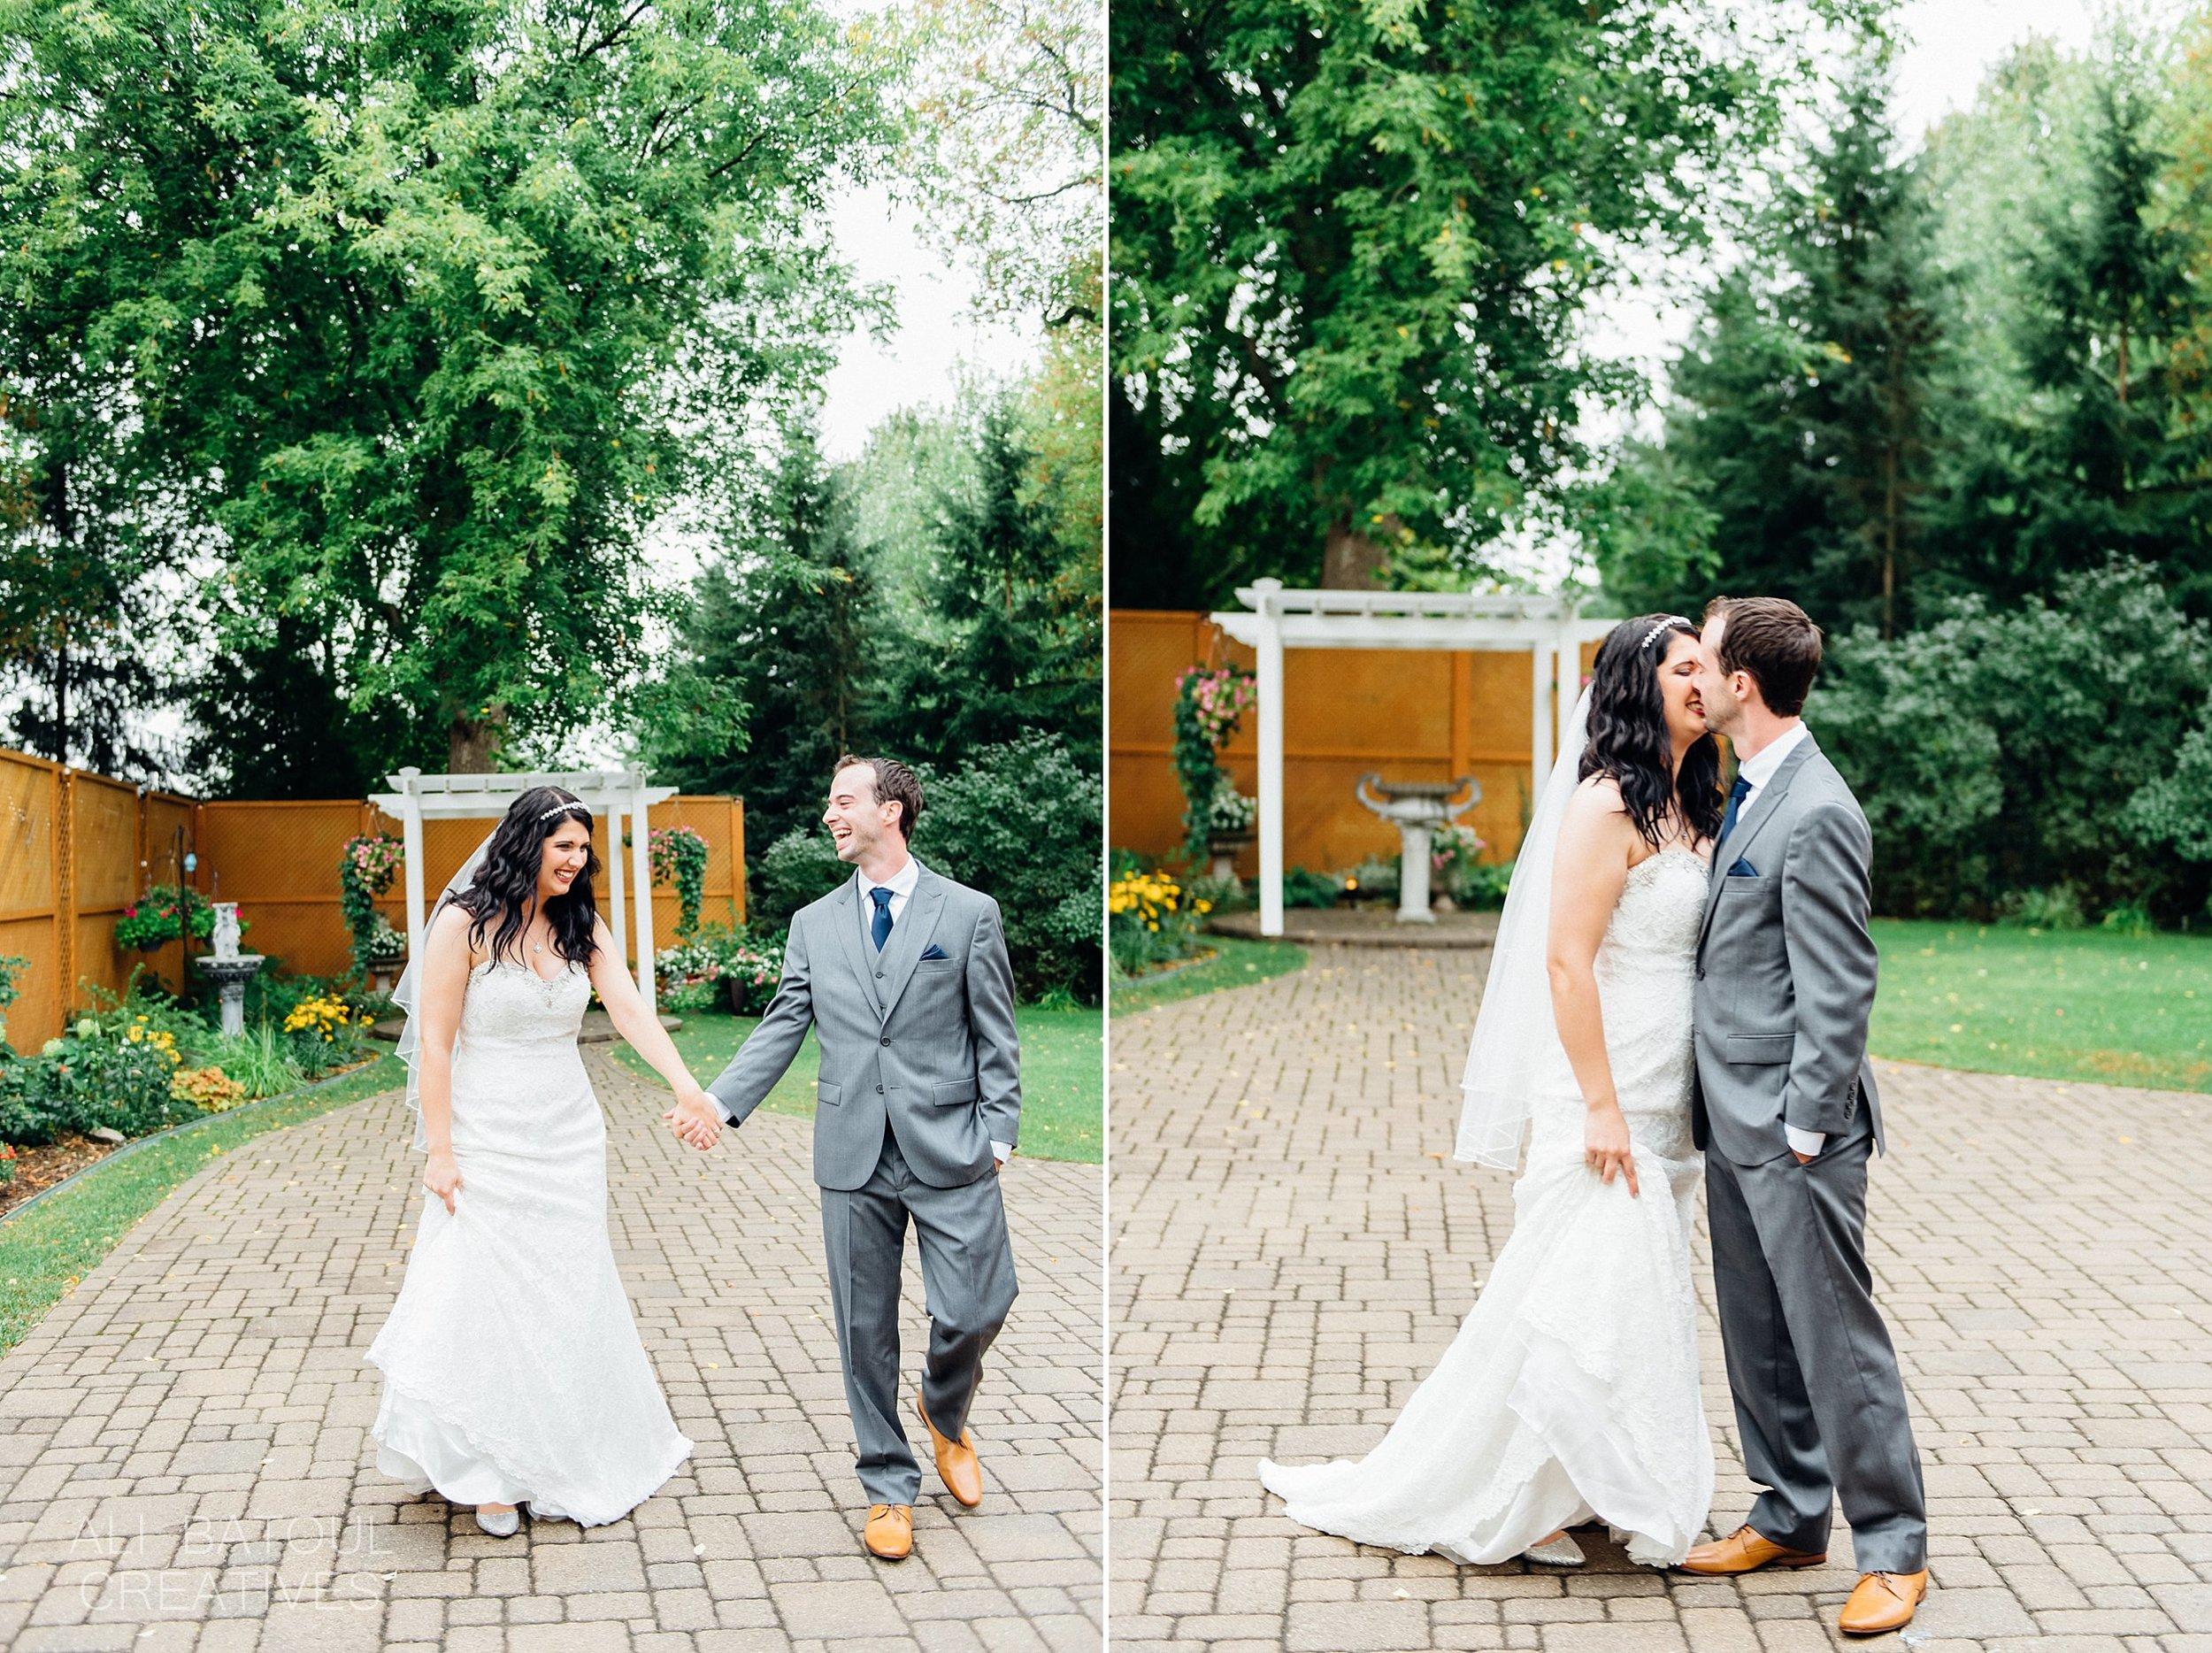 Jocelyn + Steve At The Schoolhouse Wedding - Ali and Batoul Fine Art Wedding Photography_0032.jpg